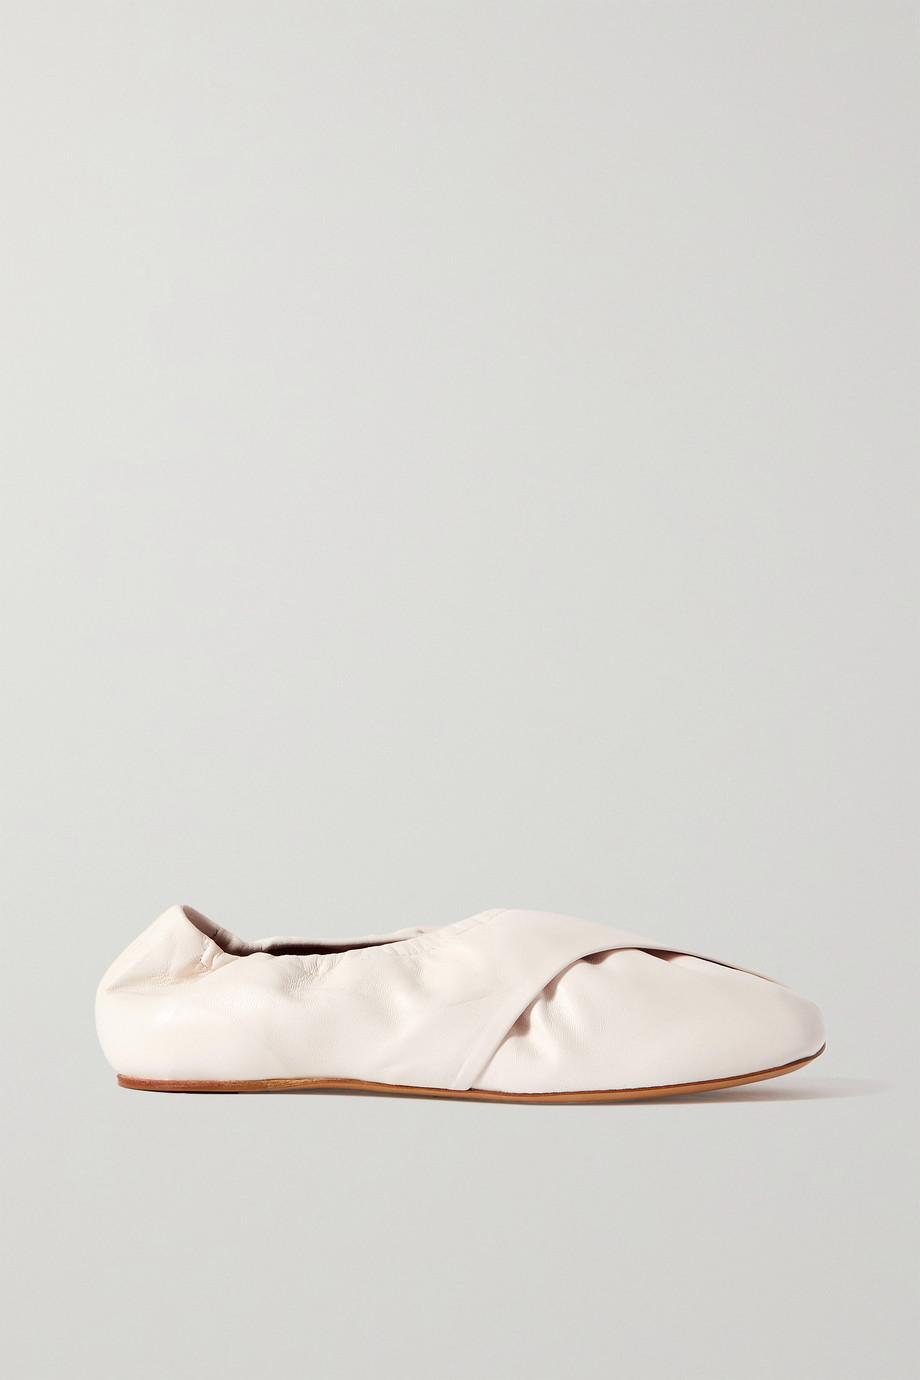 Dries Van Noten Donna leather ballet flats